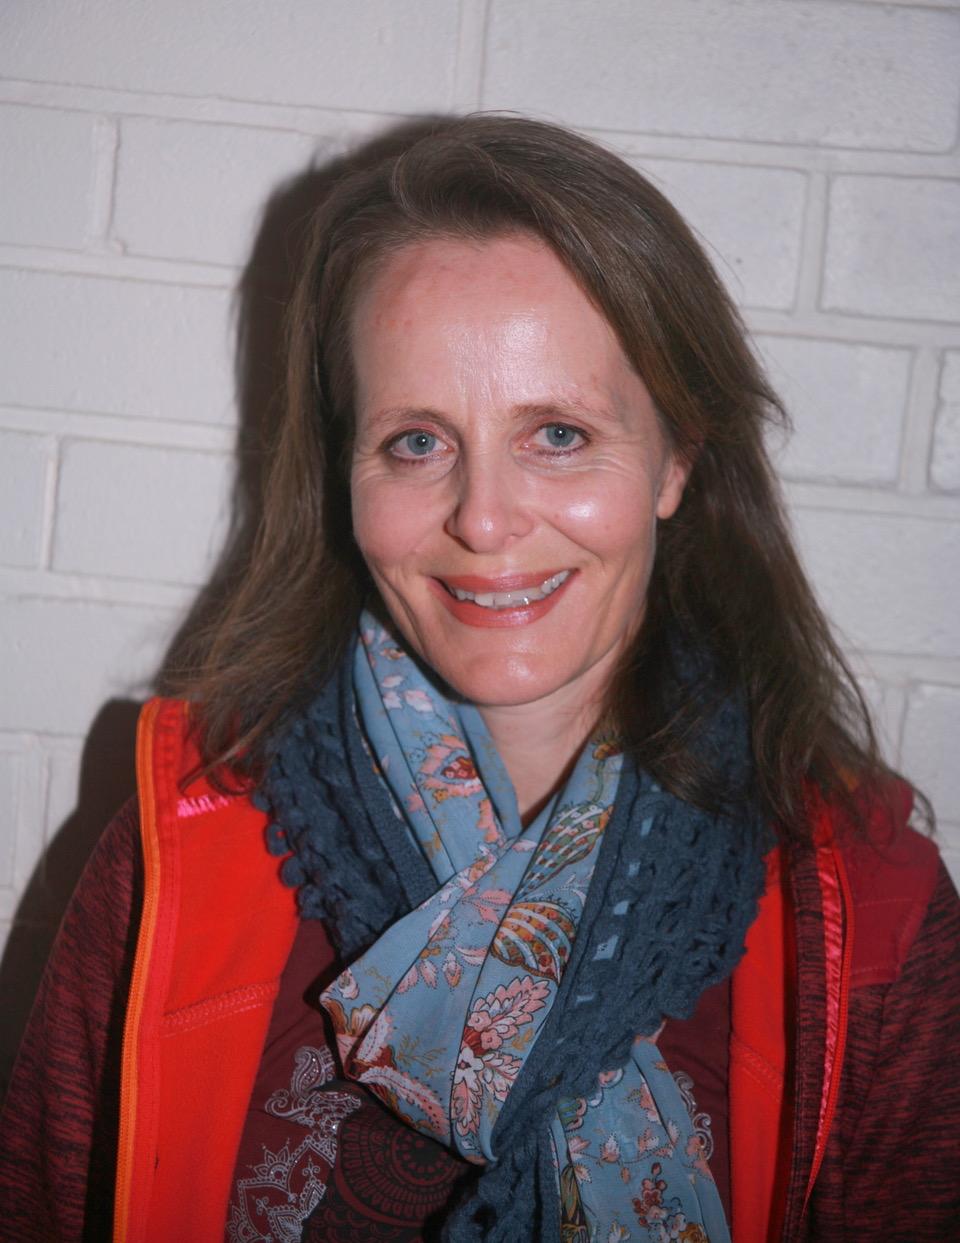 Sibylle Härtwig